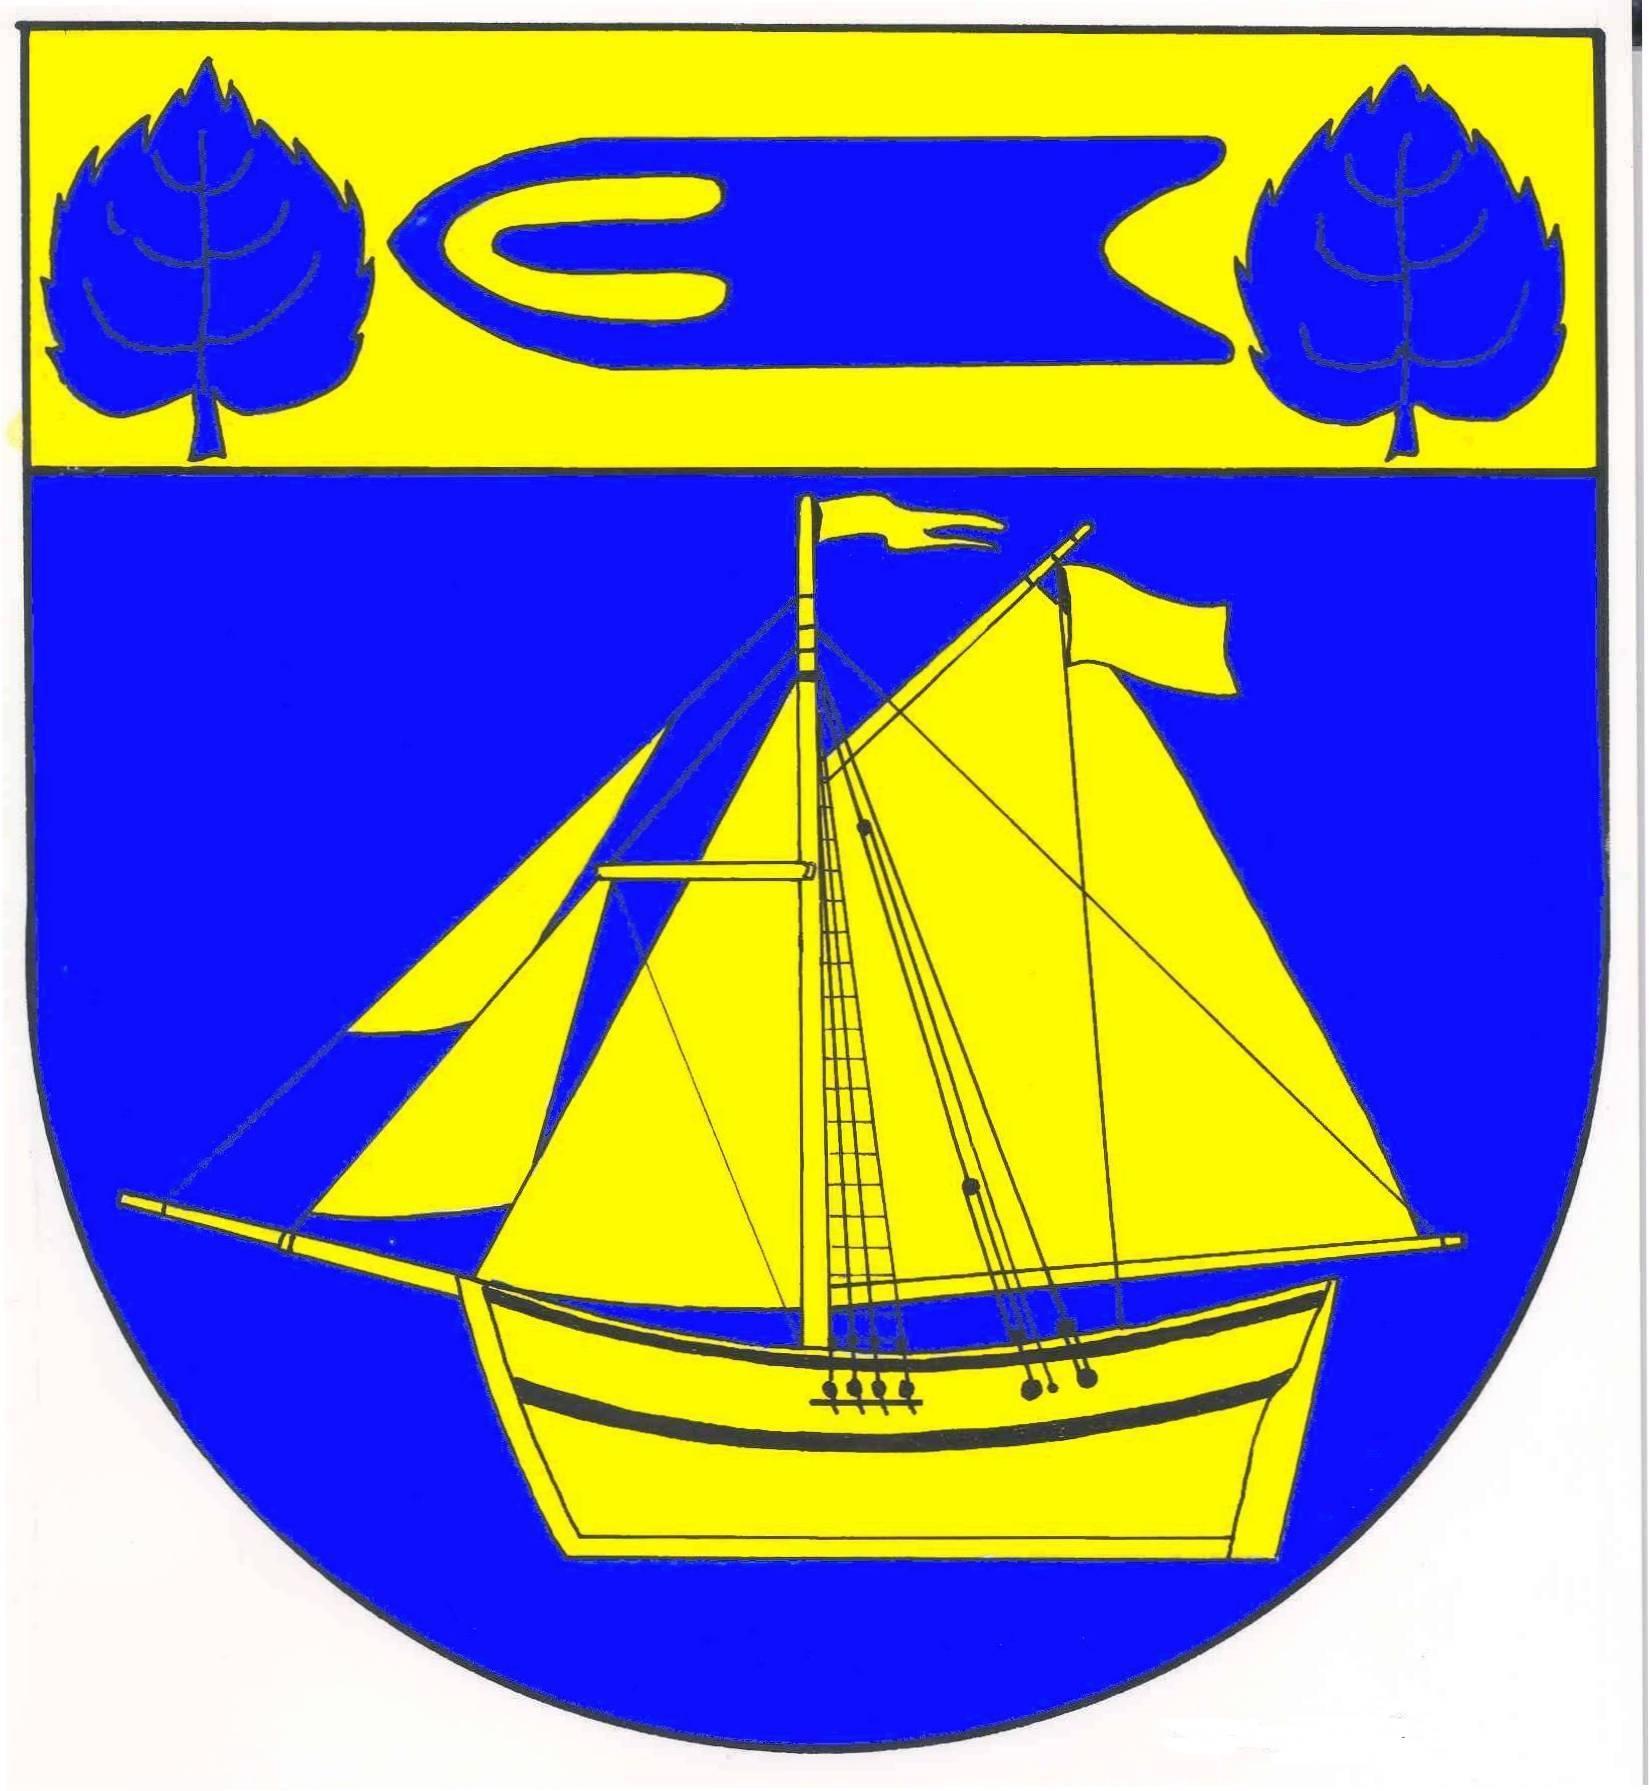 Wappen StadtArnis, Kreis Schleswig-Flensburg